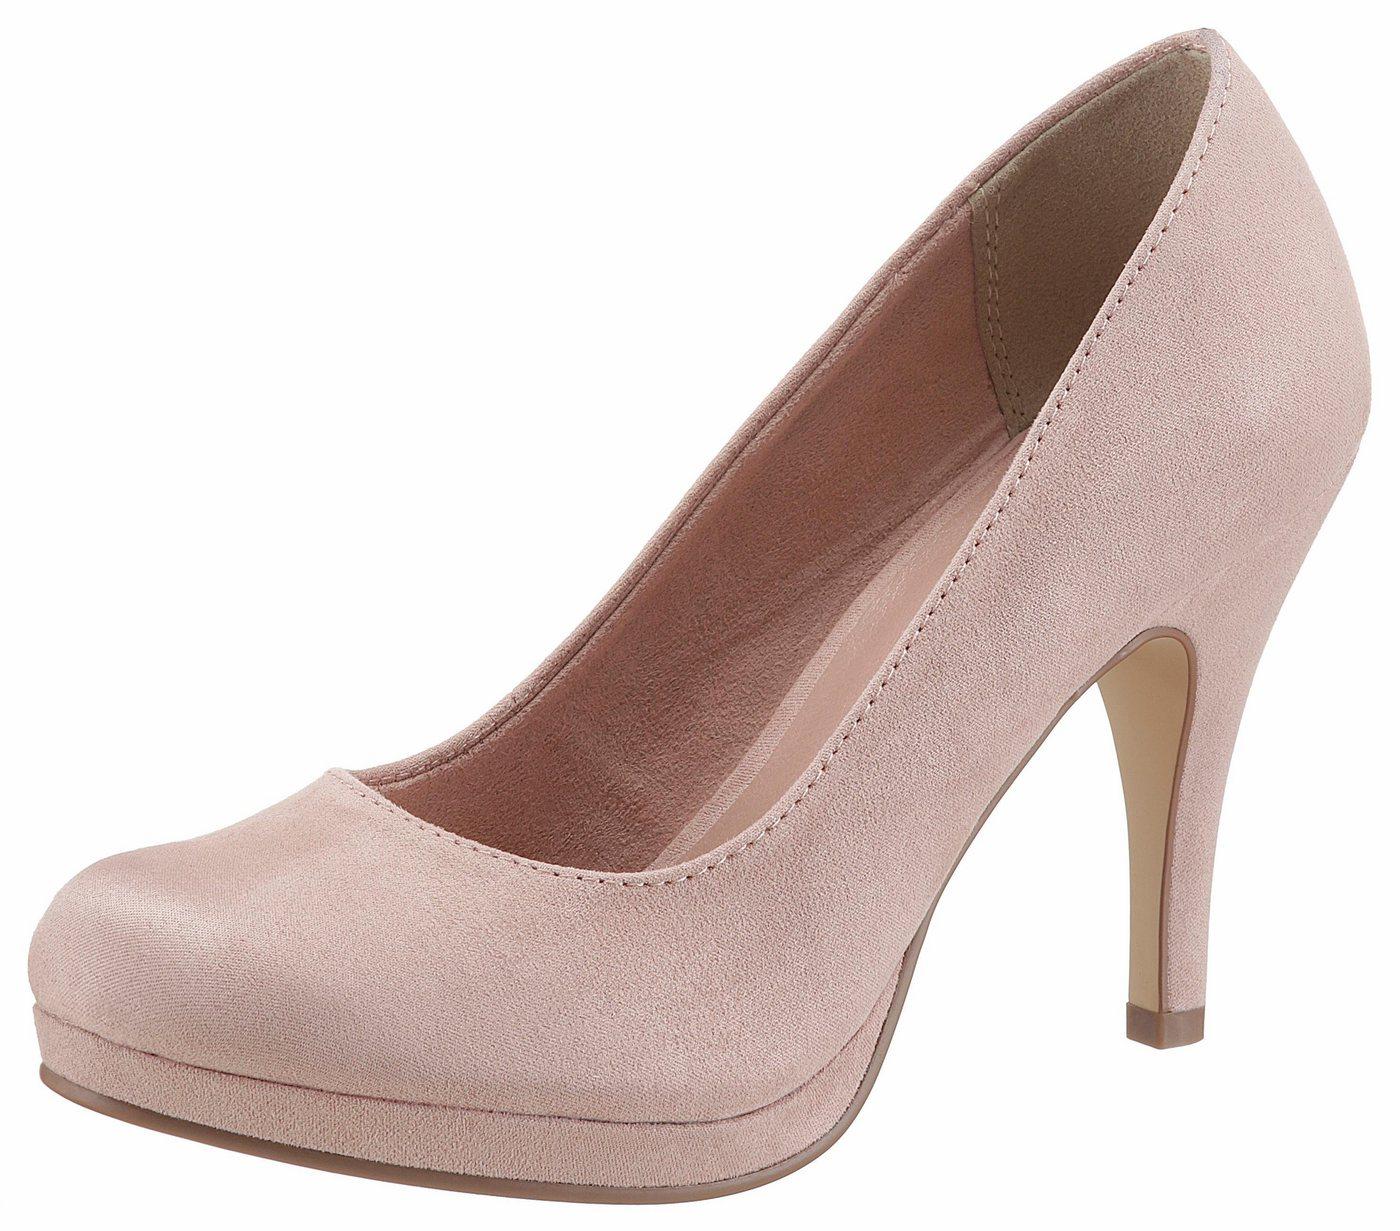 Tamaris »Taggia« High-Heel-Pumps mit Plateau | Schuhe > High Heels > High Heel Pumps | Rosa | Tamaris